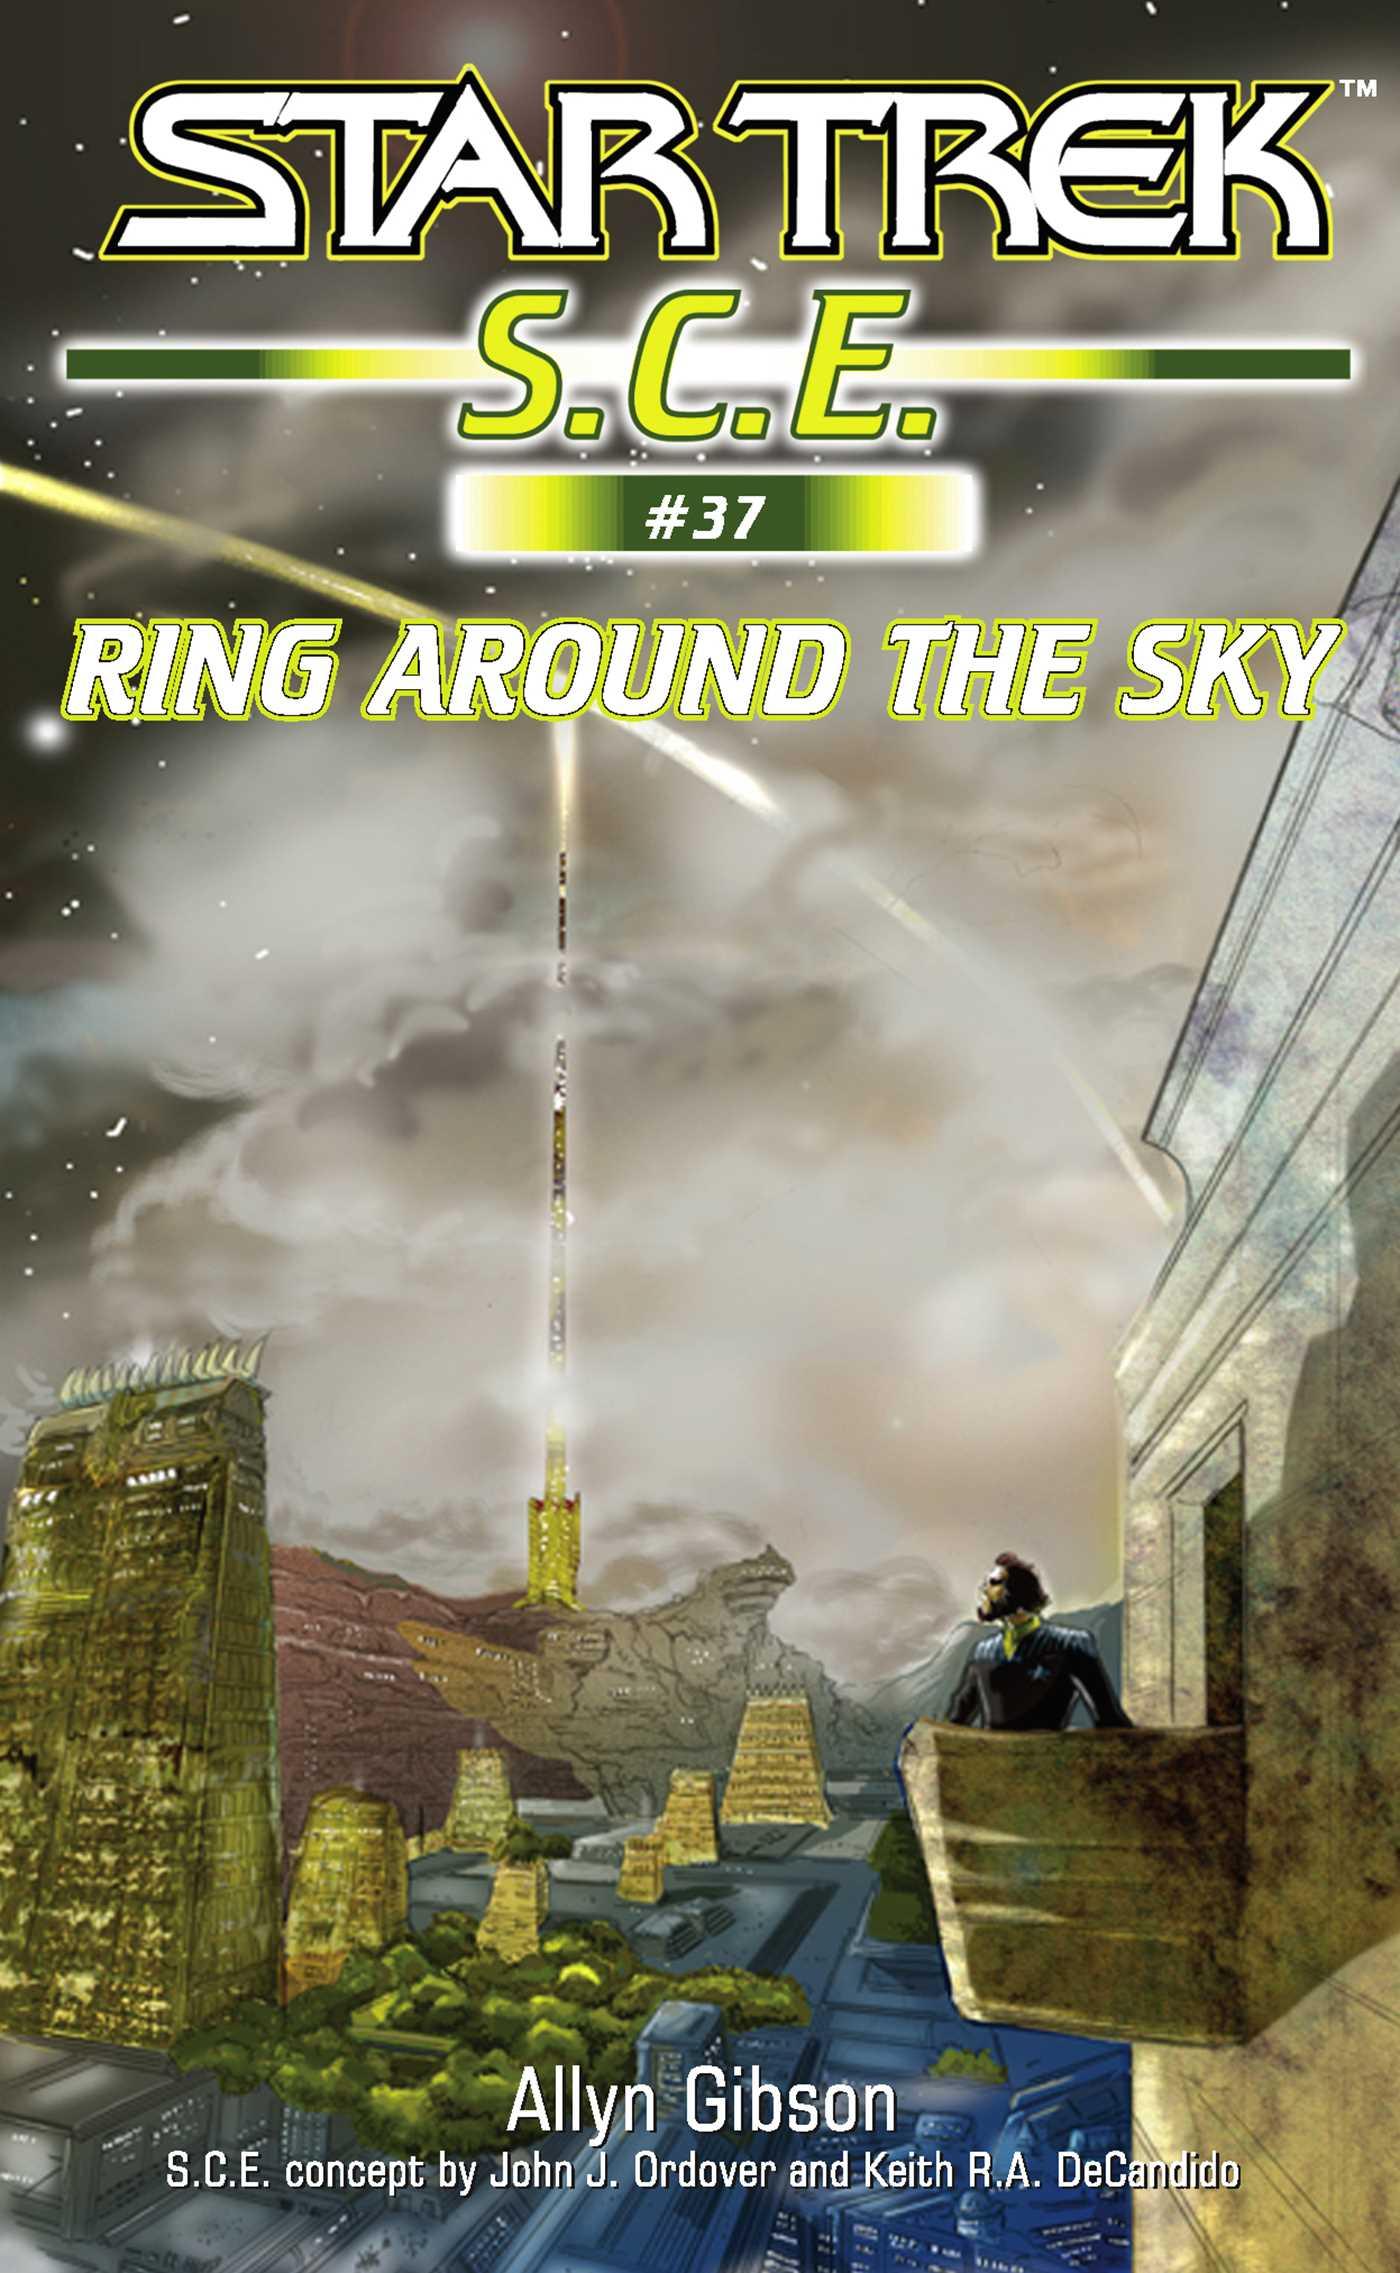 Star trek ring around the sky 9780743476119 hr